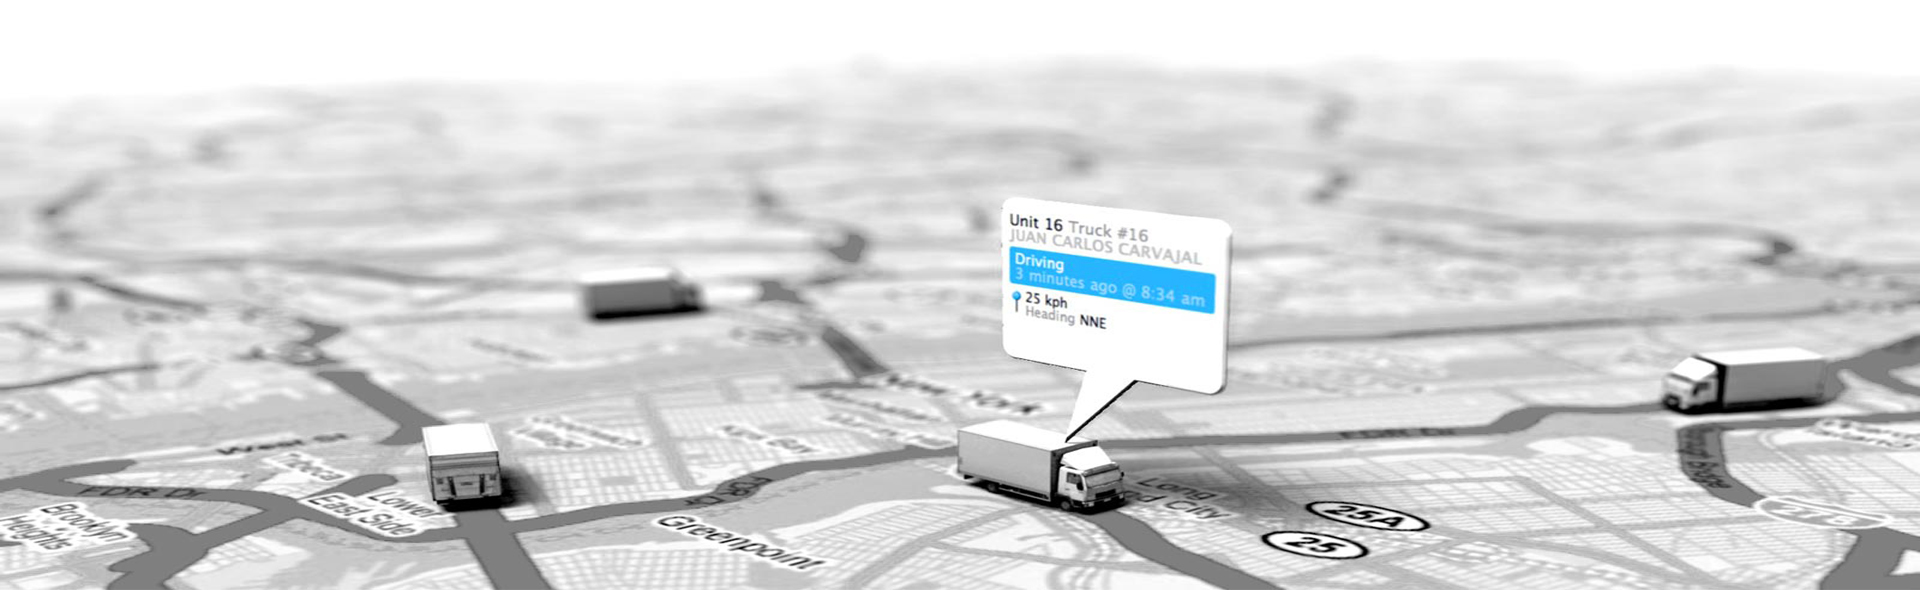 banner-gps-tracking-app